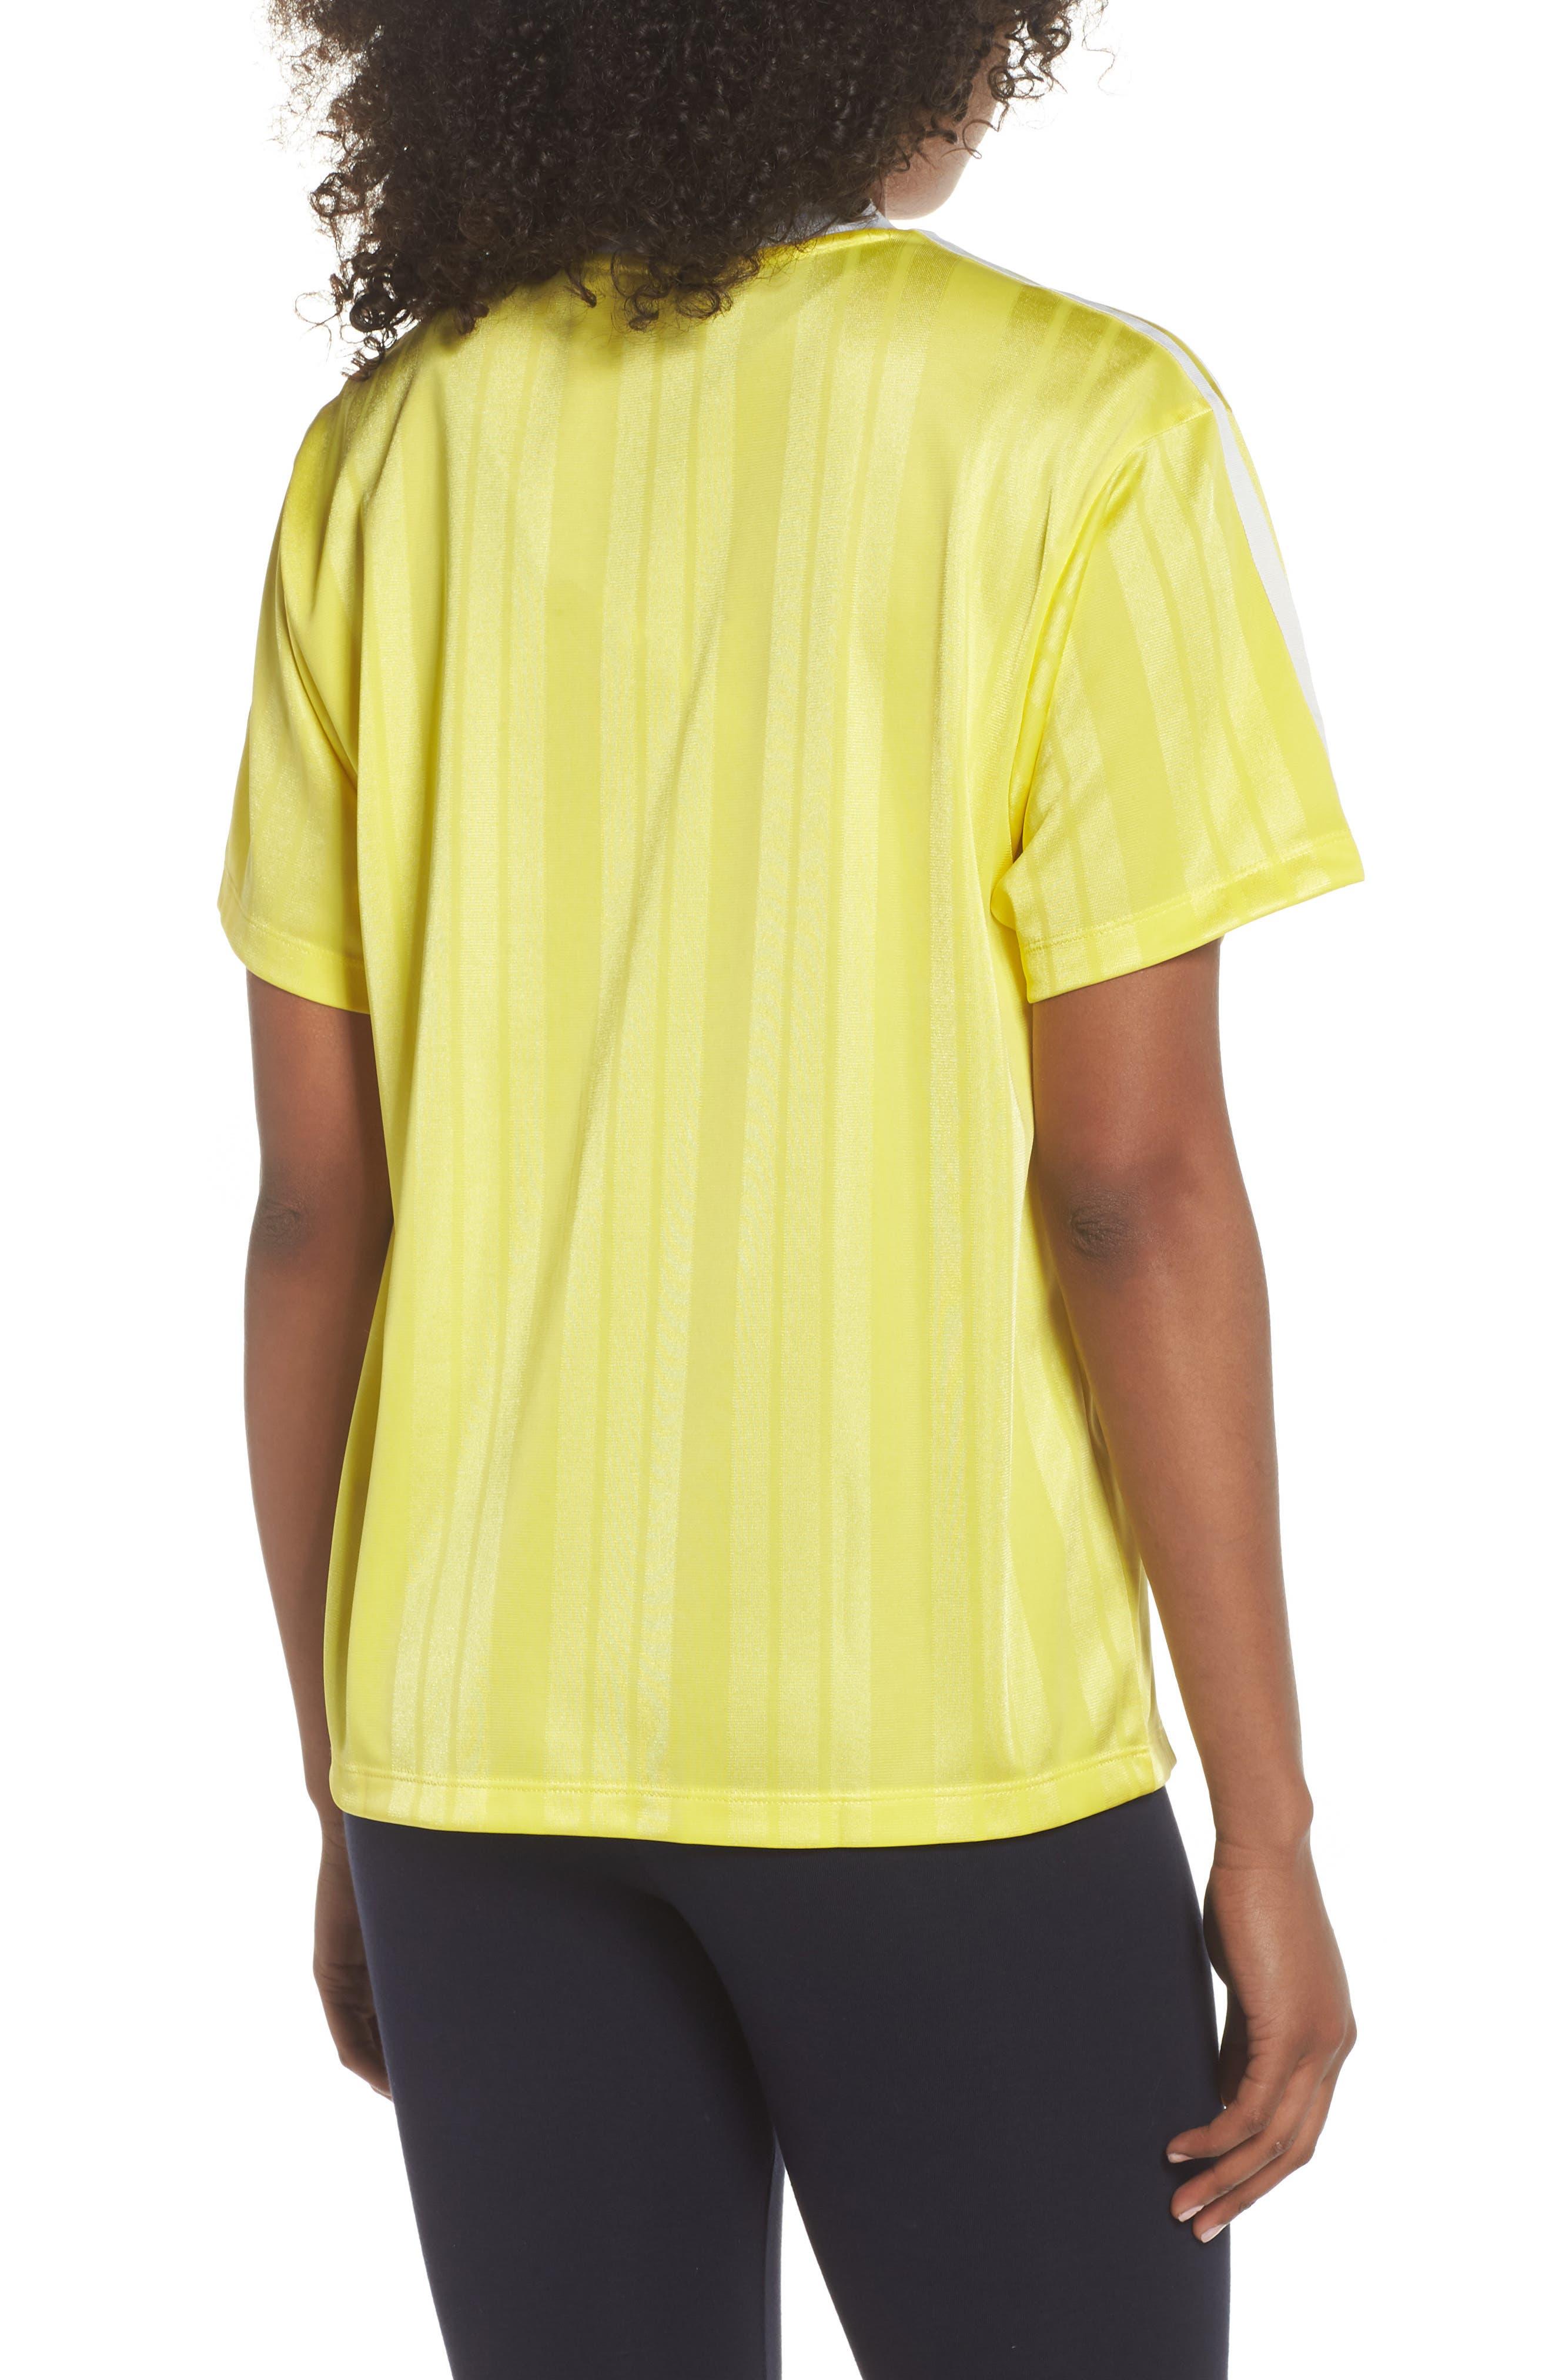 Originals Fashion League Jersey Tee,                             Alternate thumbnail 2, color,                             Prime Yellow